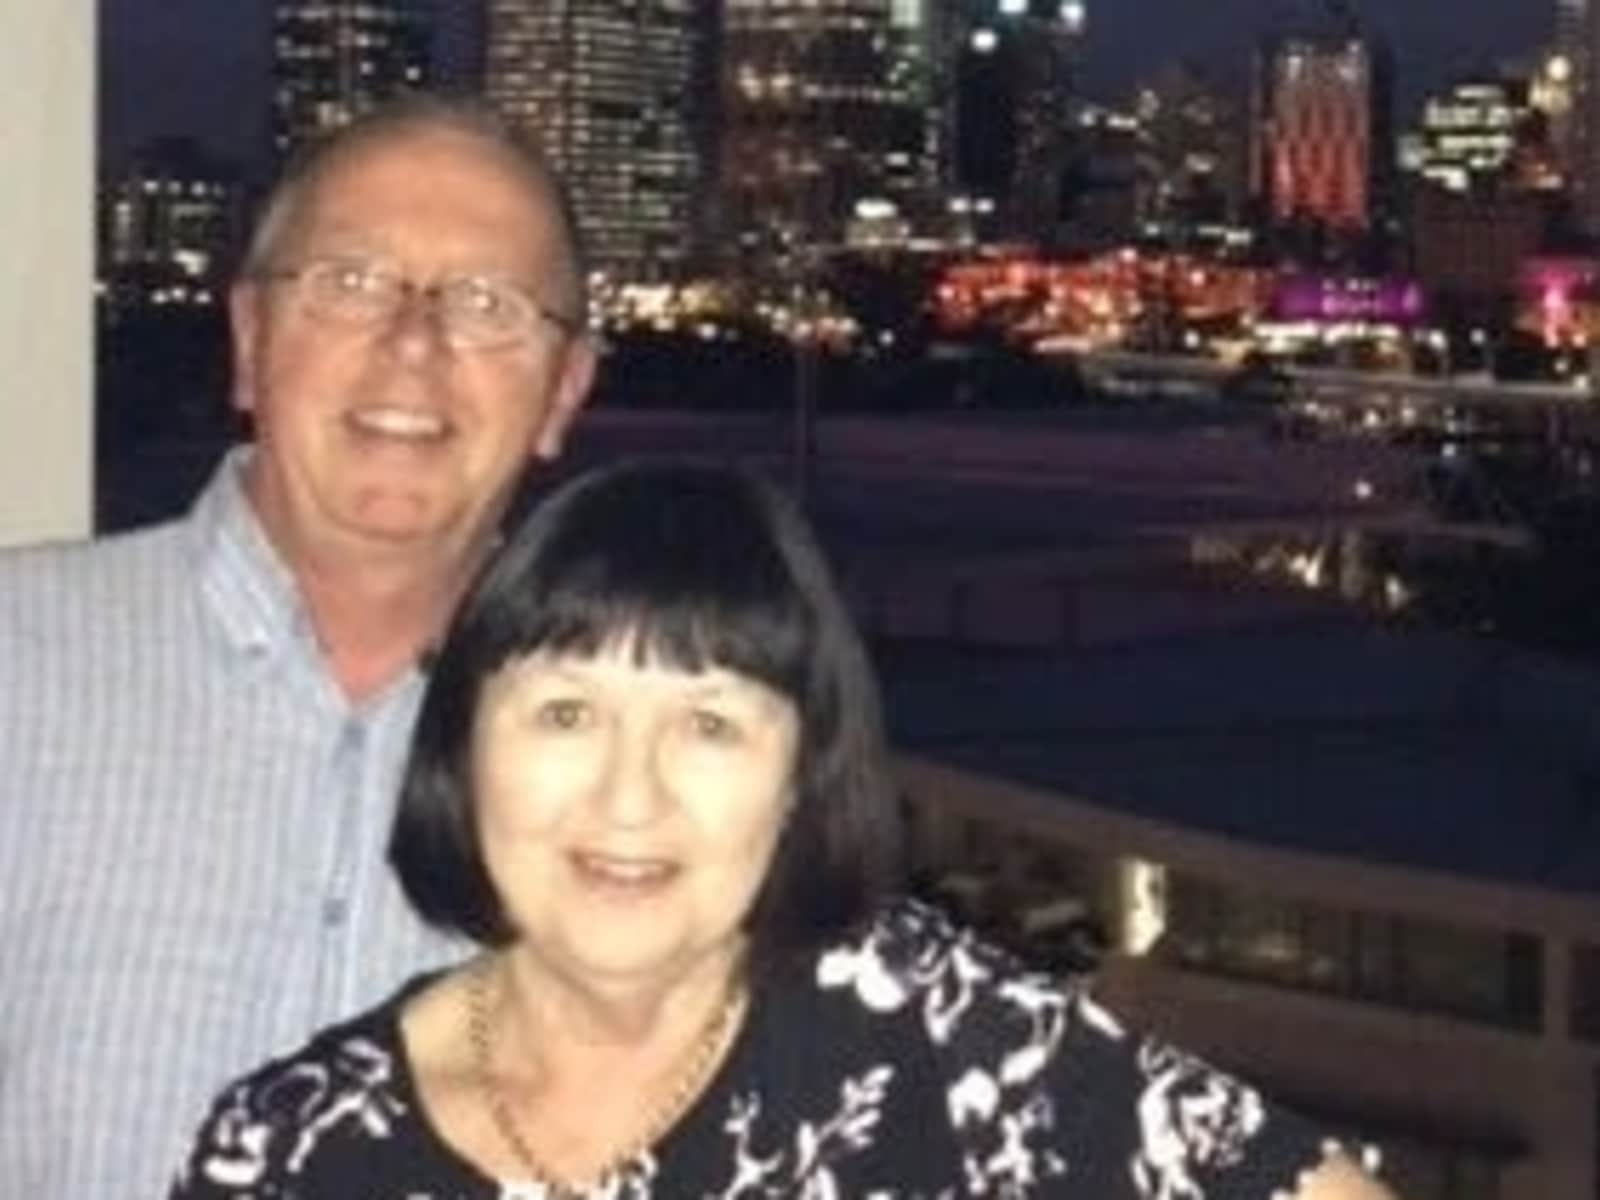 Brenda & Philip from Invercargill, New Zealand